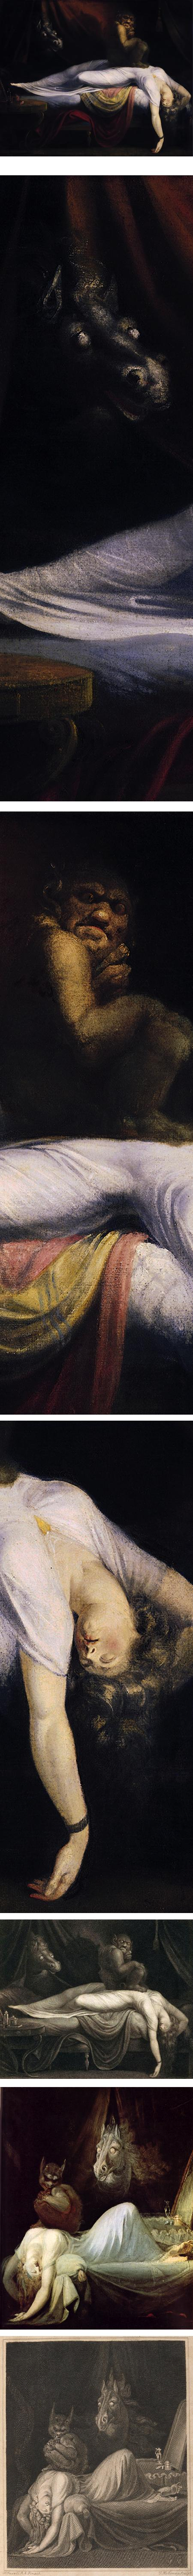 The Nightmare, Henru Fuseli